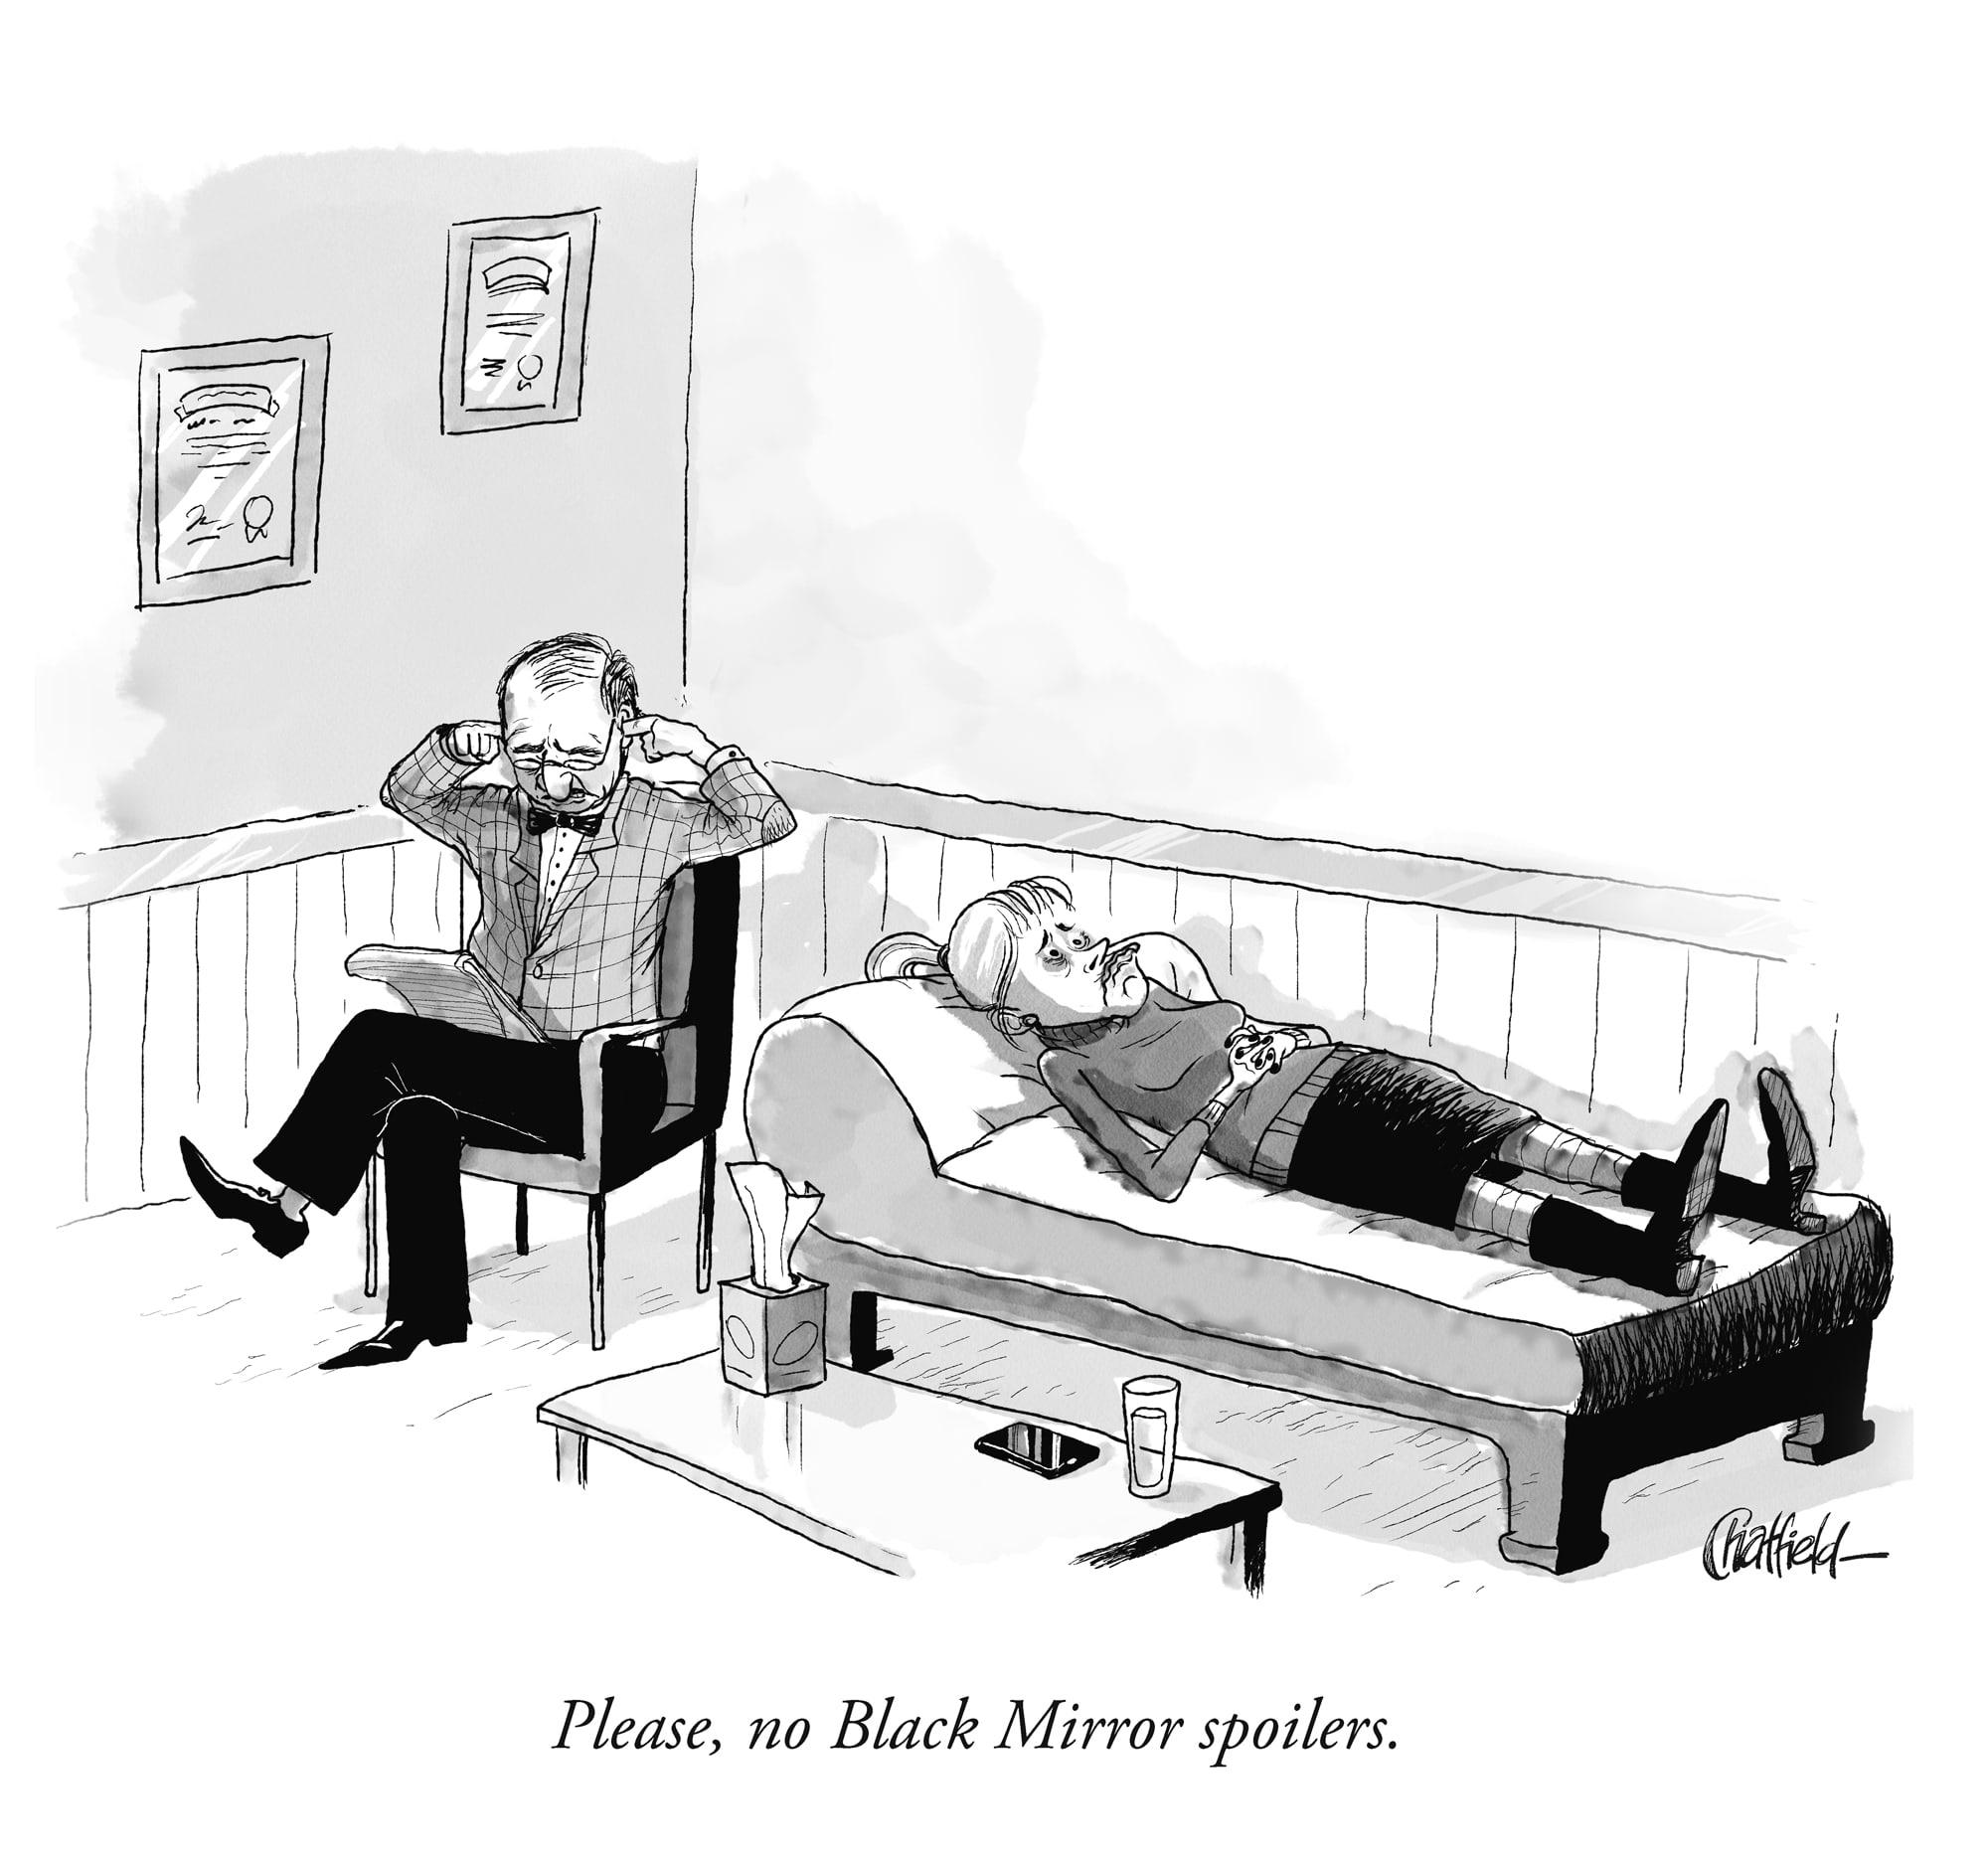 20180114 - Please, No Black Mirror Spoilers-min.jpg